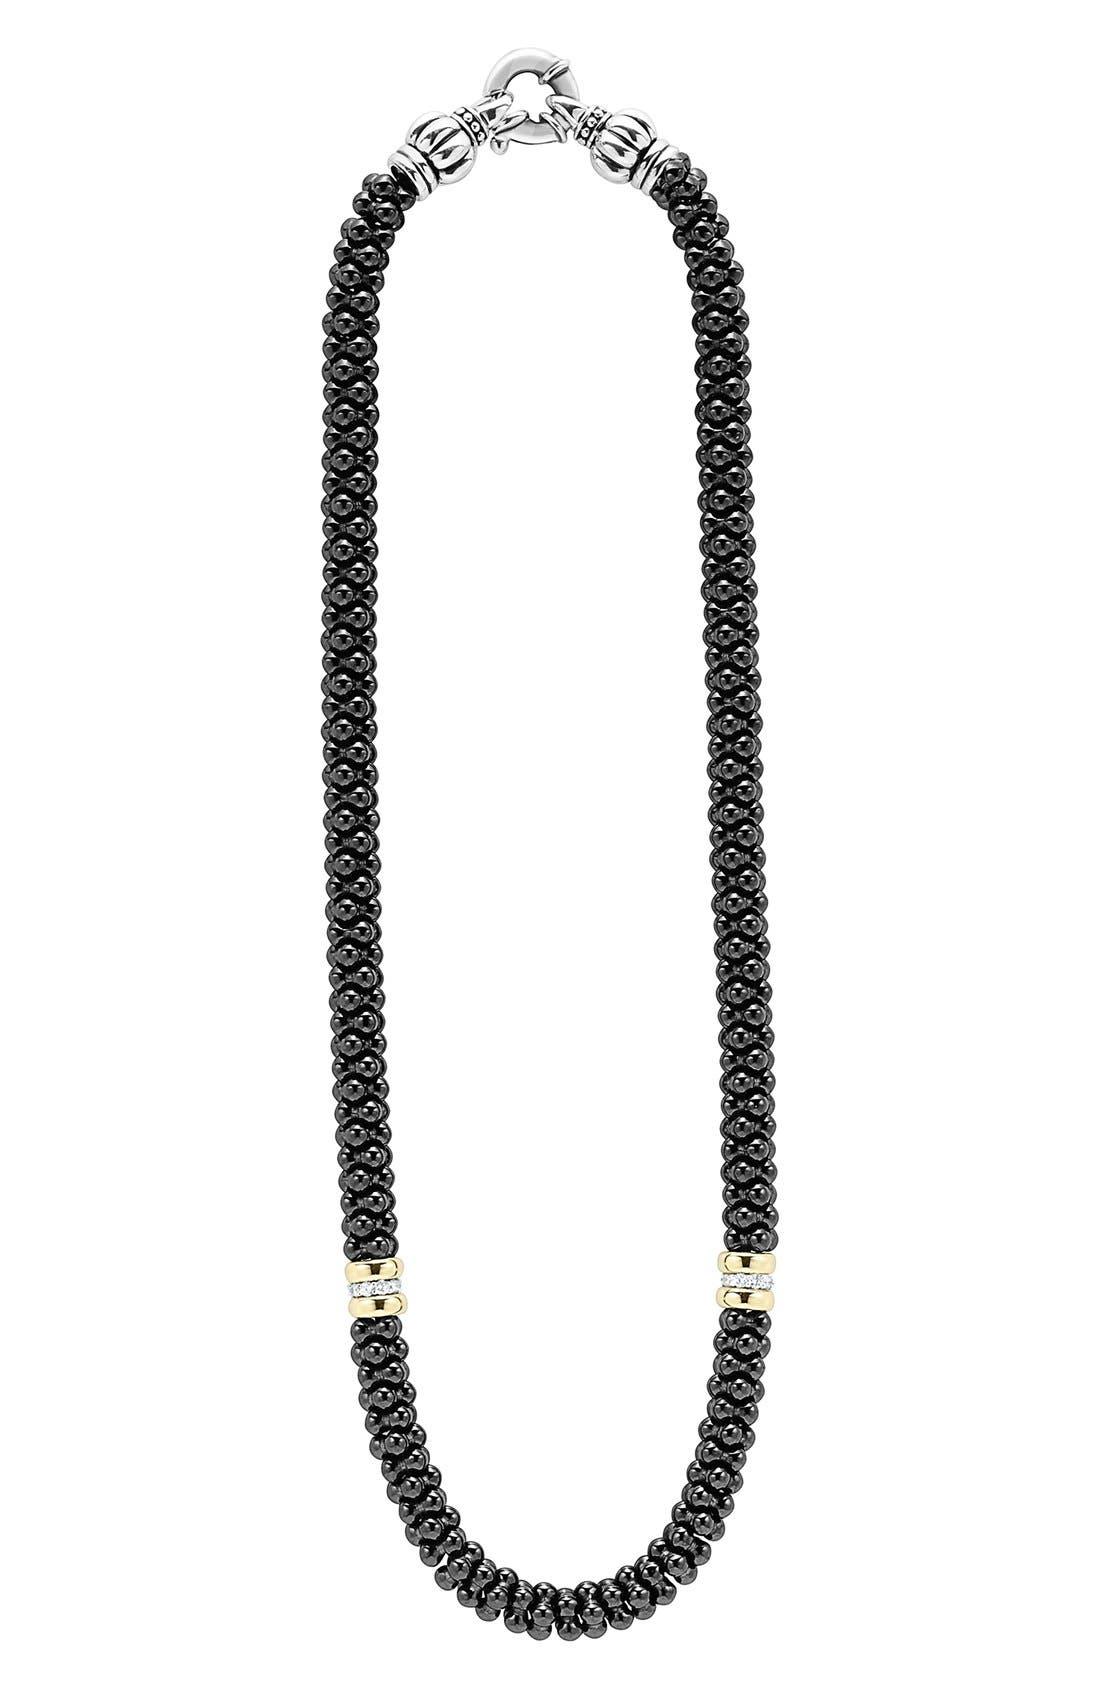 LAGOS 'Black Caviar' 7mm Beaded Diamond Station Necklace, Main, color, 001